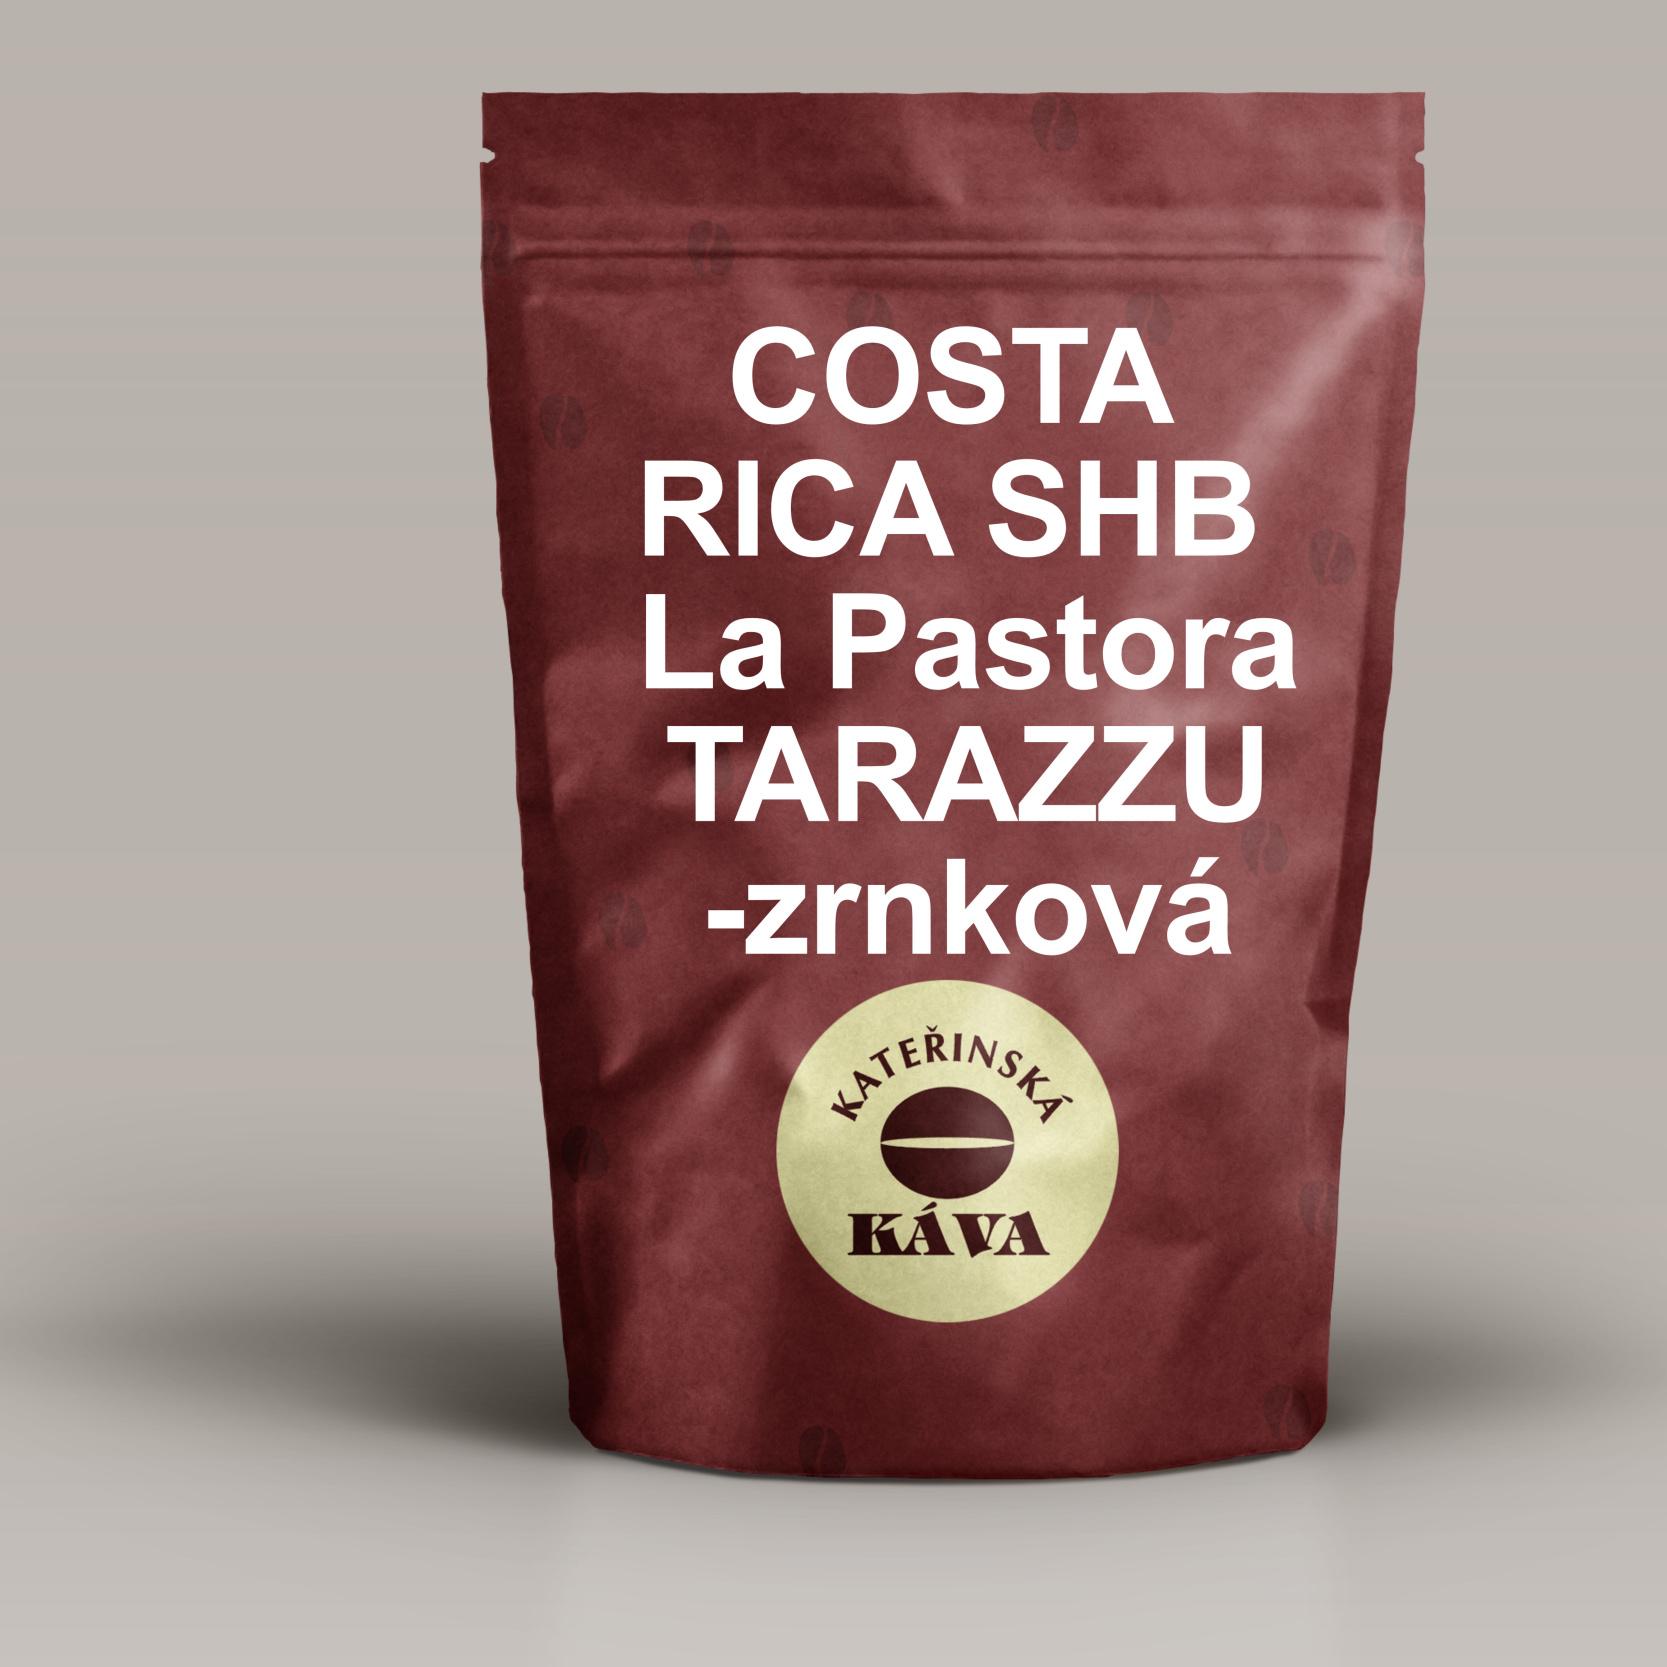 COSTA RICA  SHB La Pastora TARAZZU -zrnková